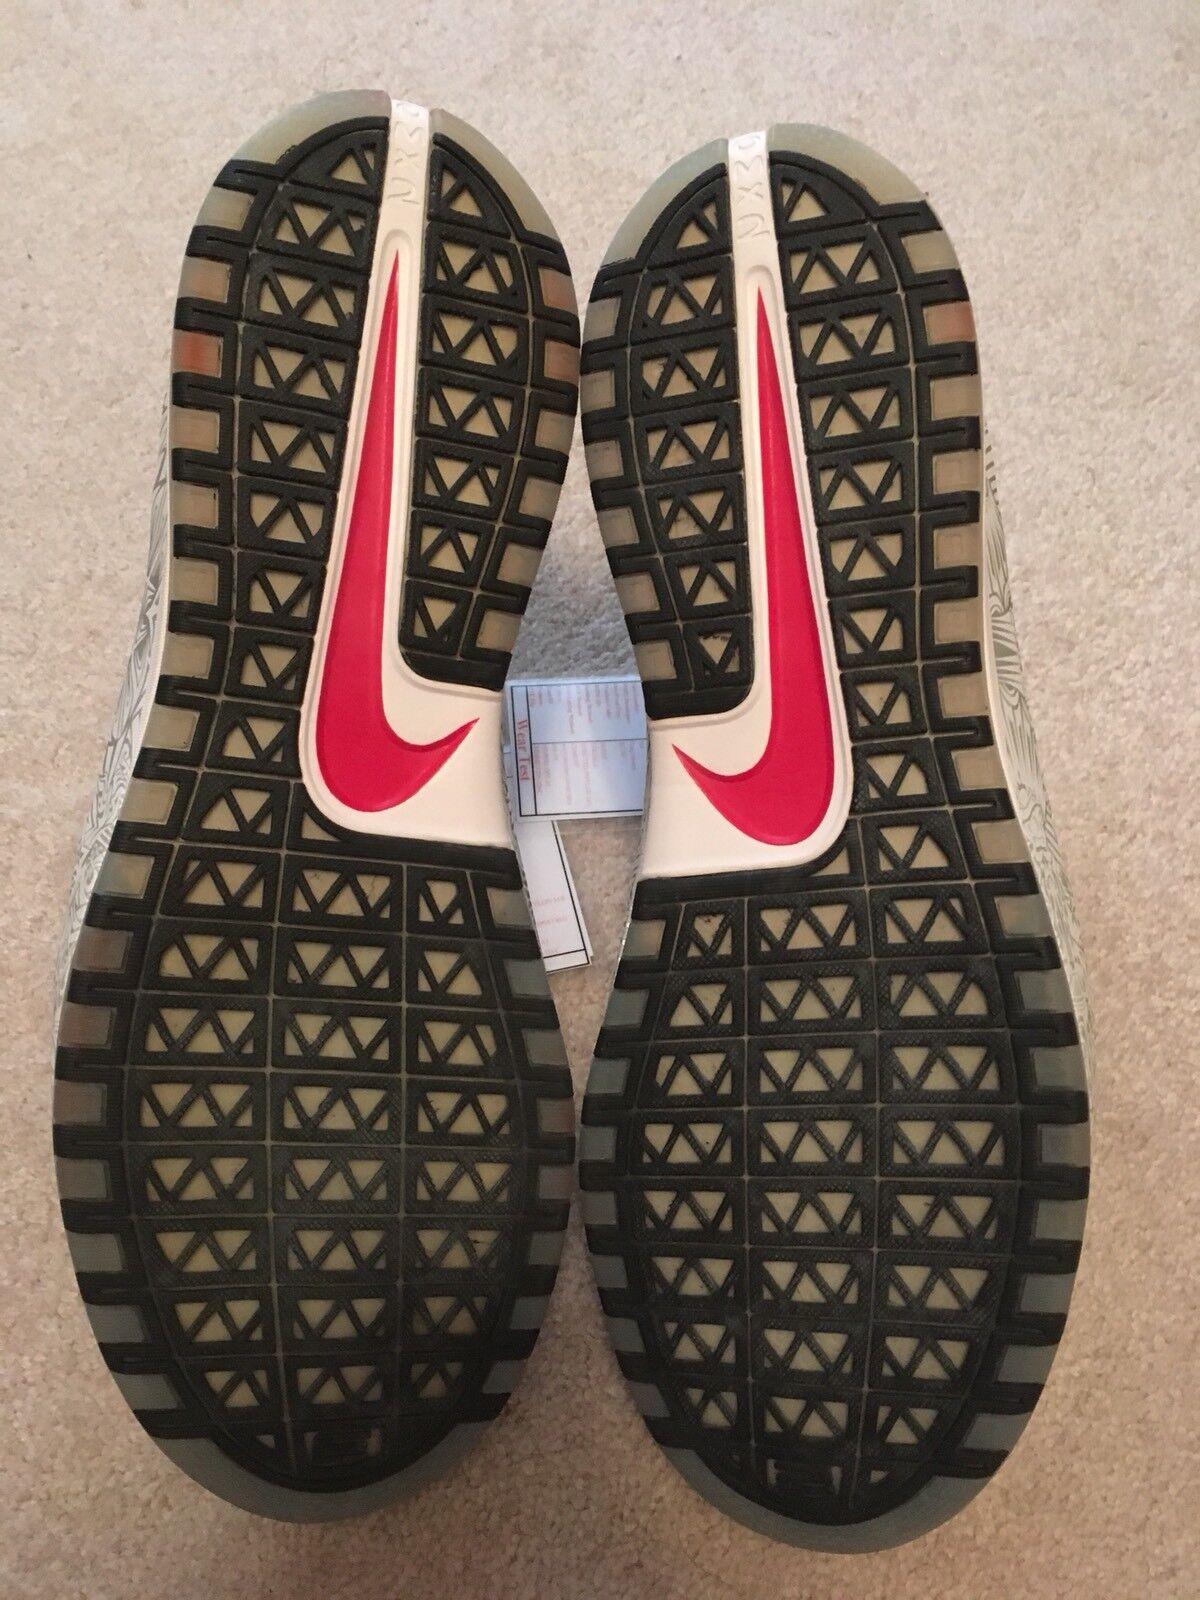 Nike zoom lebron 6 usa usa usa weartest campione sz 16 rari lebron pe lebron campione 7fb7be